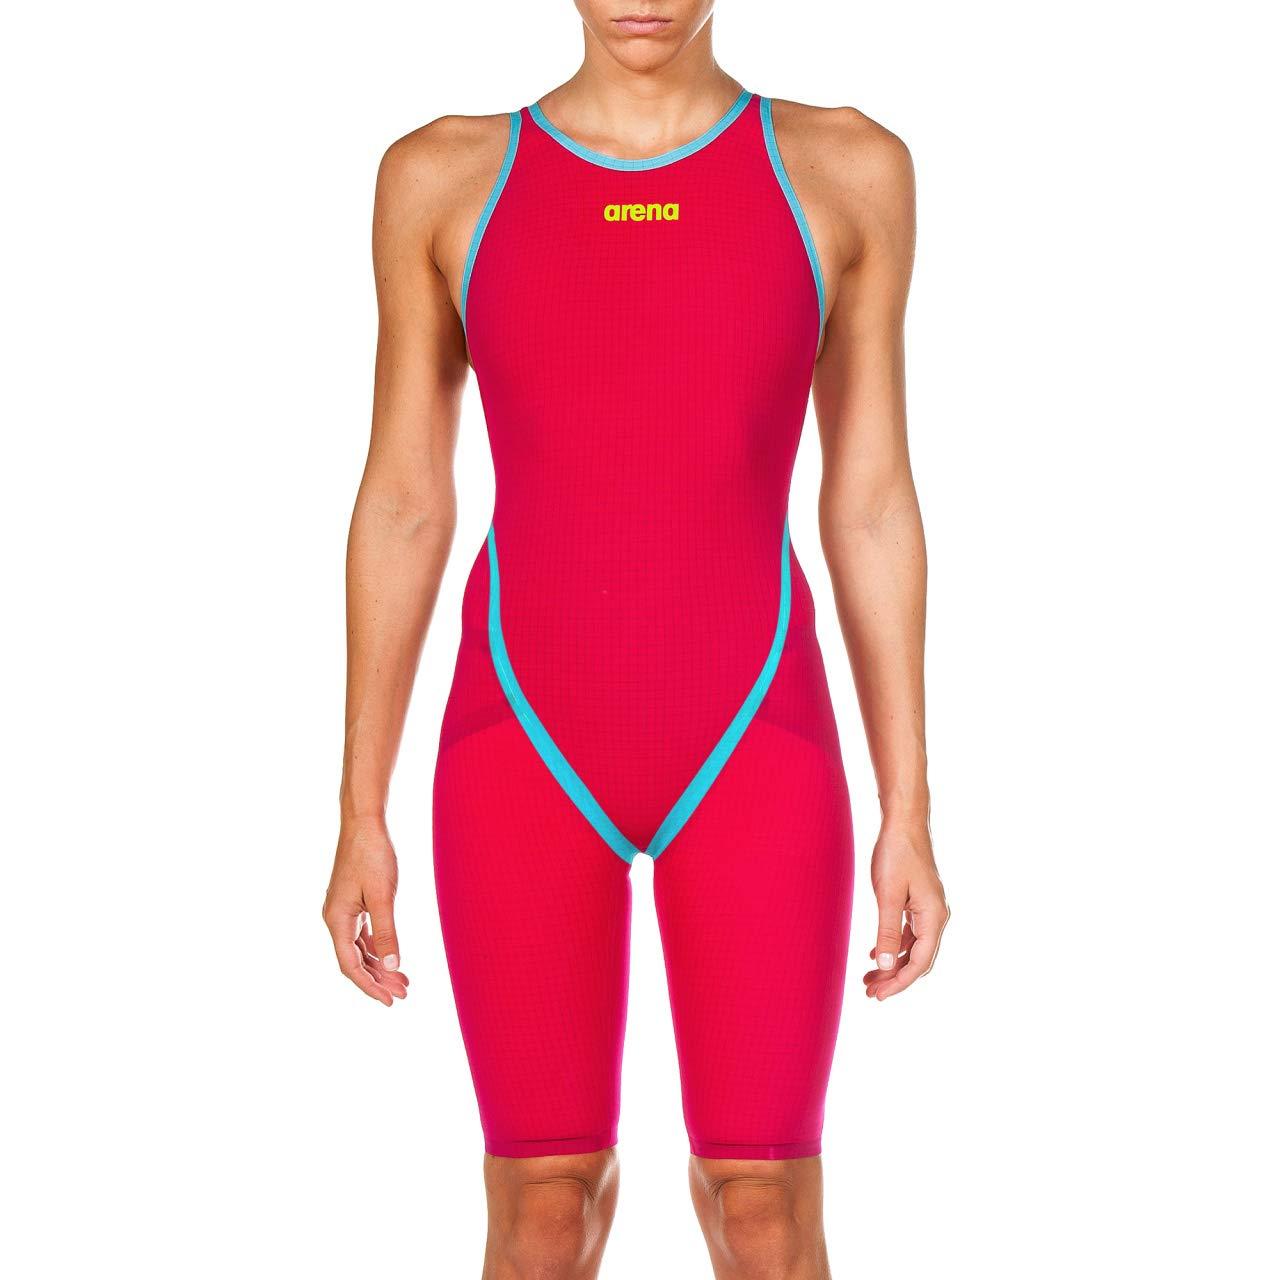 Image of Arena Women's Powerskin Carbon Flex Vx Fbsl Open Back Racing Swimsuit